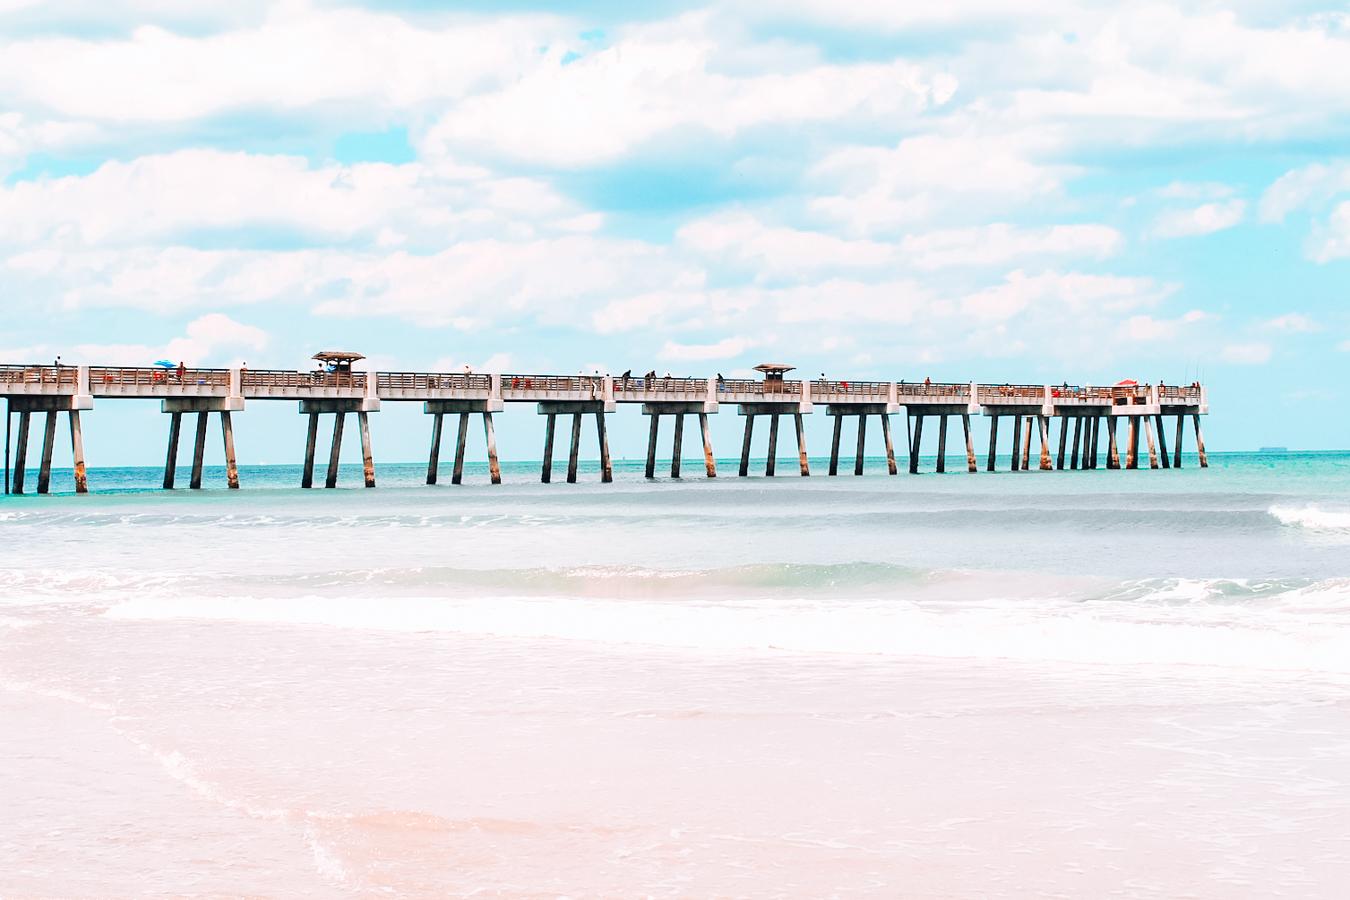 Pier of Jacksonville Beach